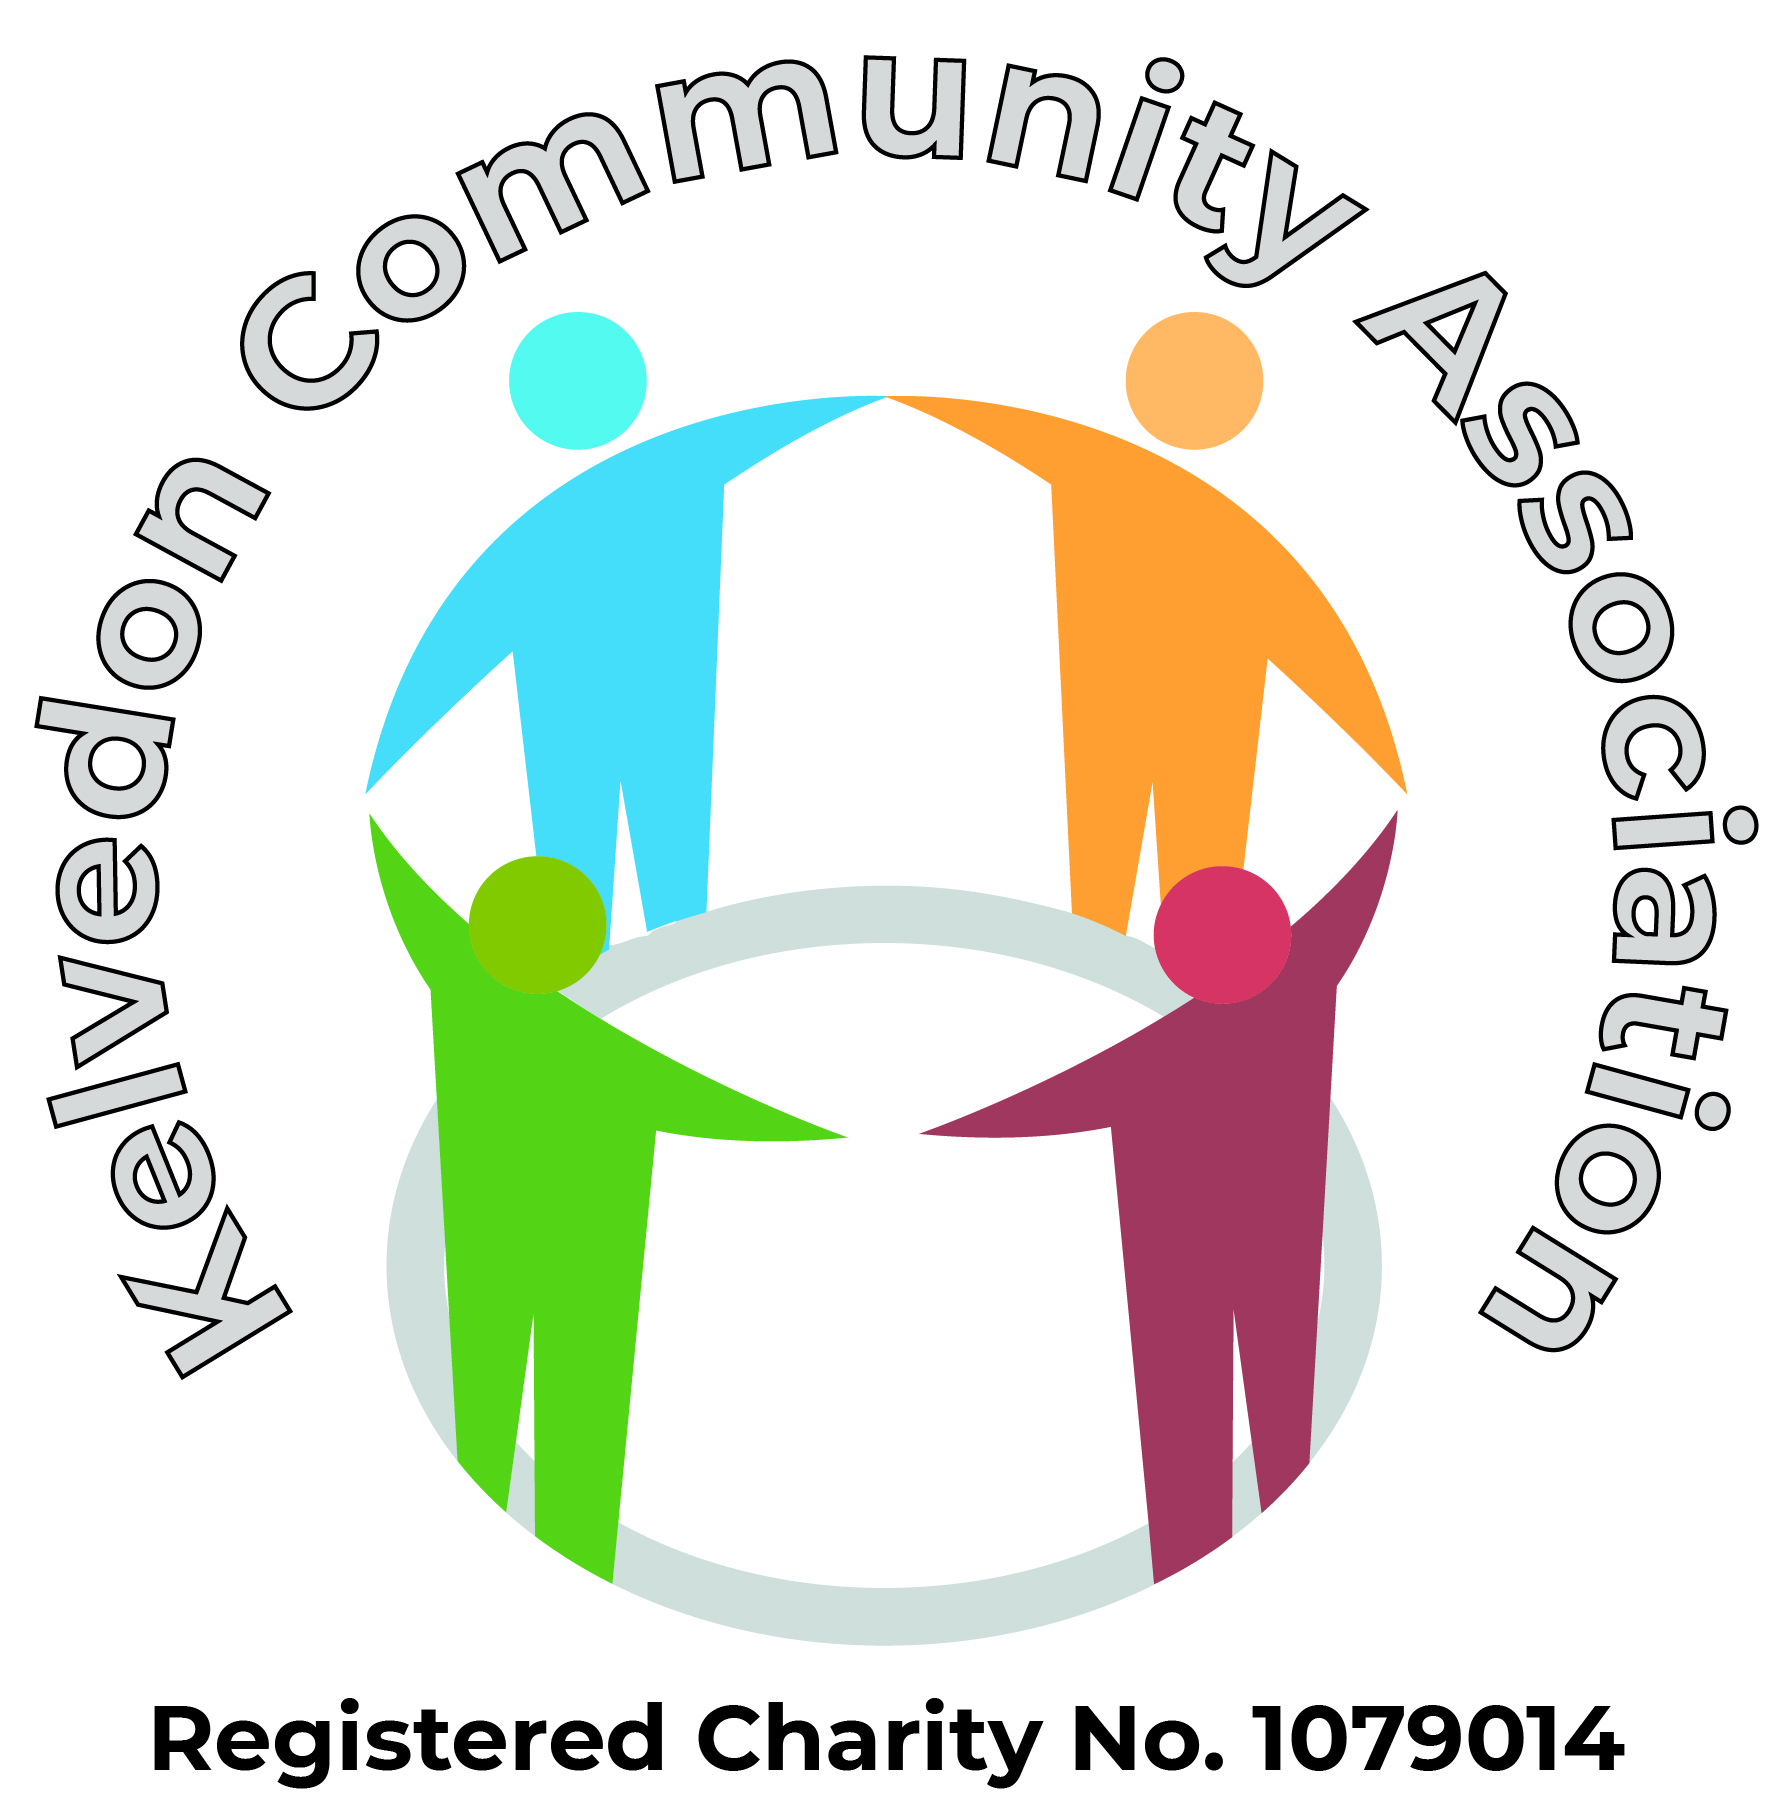 Kelvedon Community Association